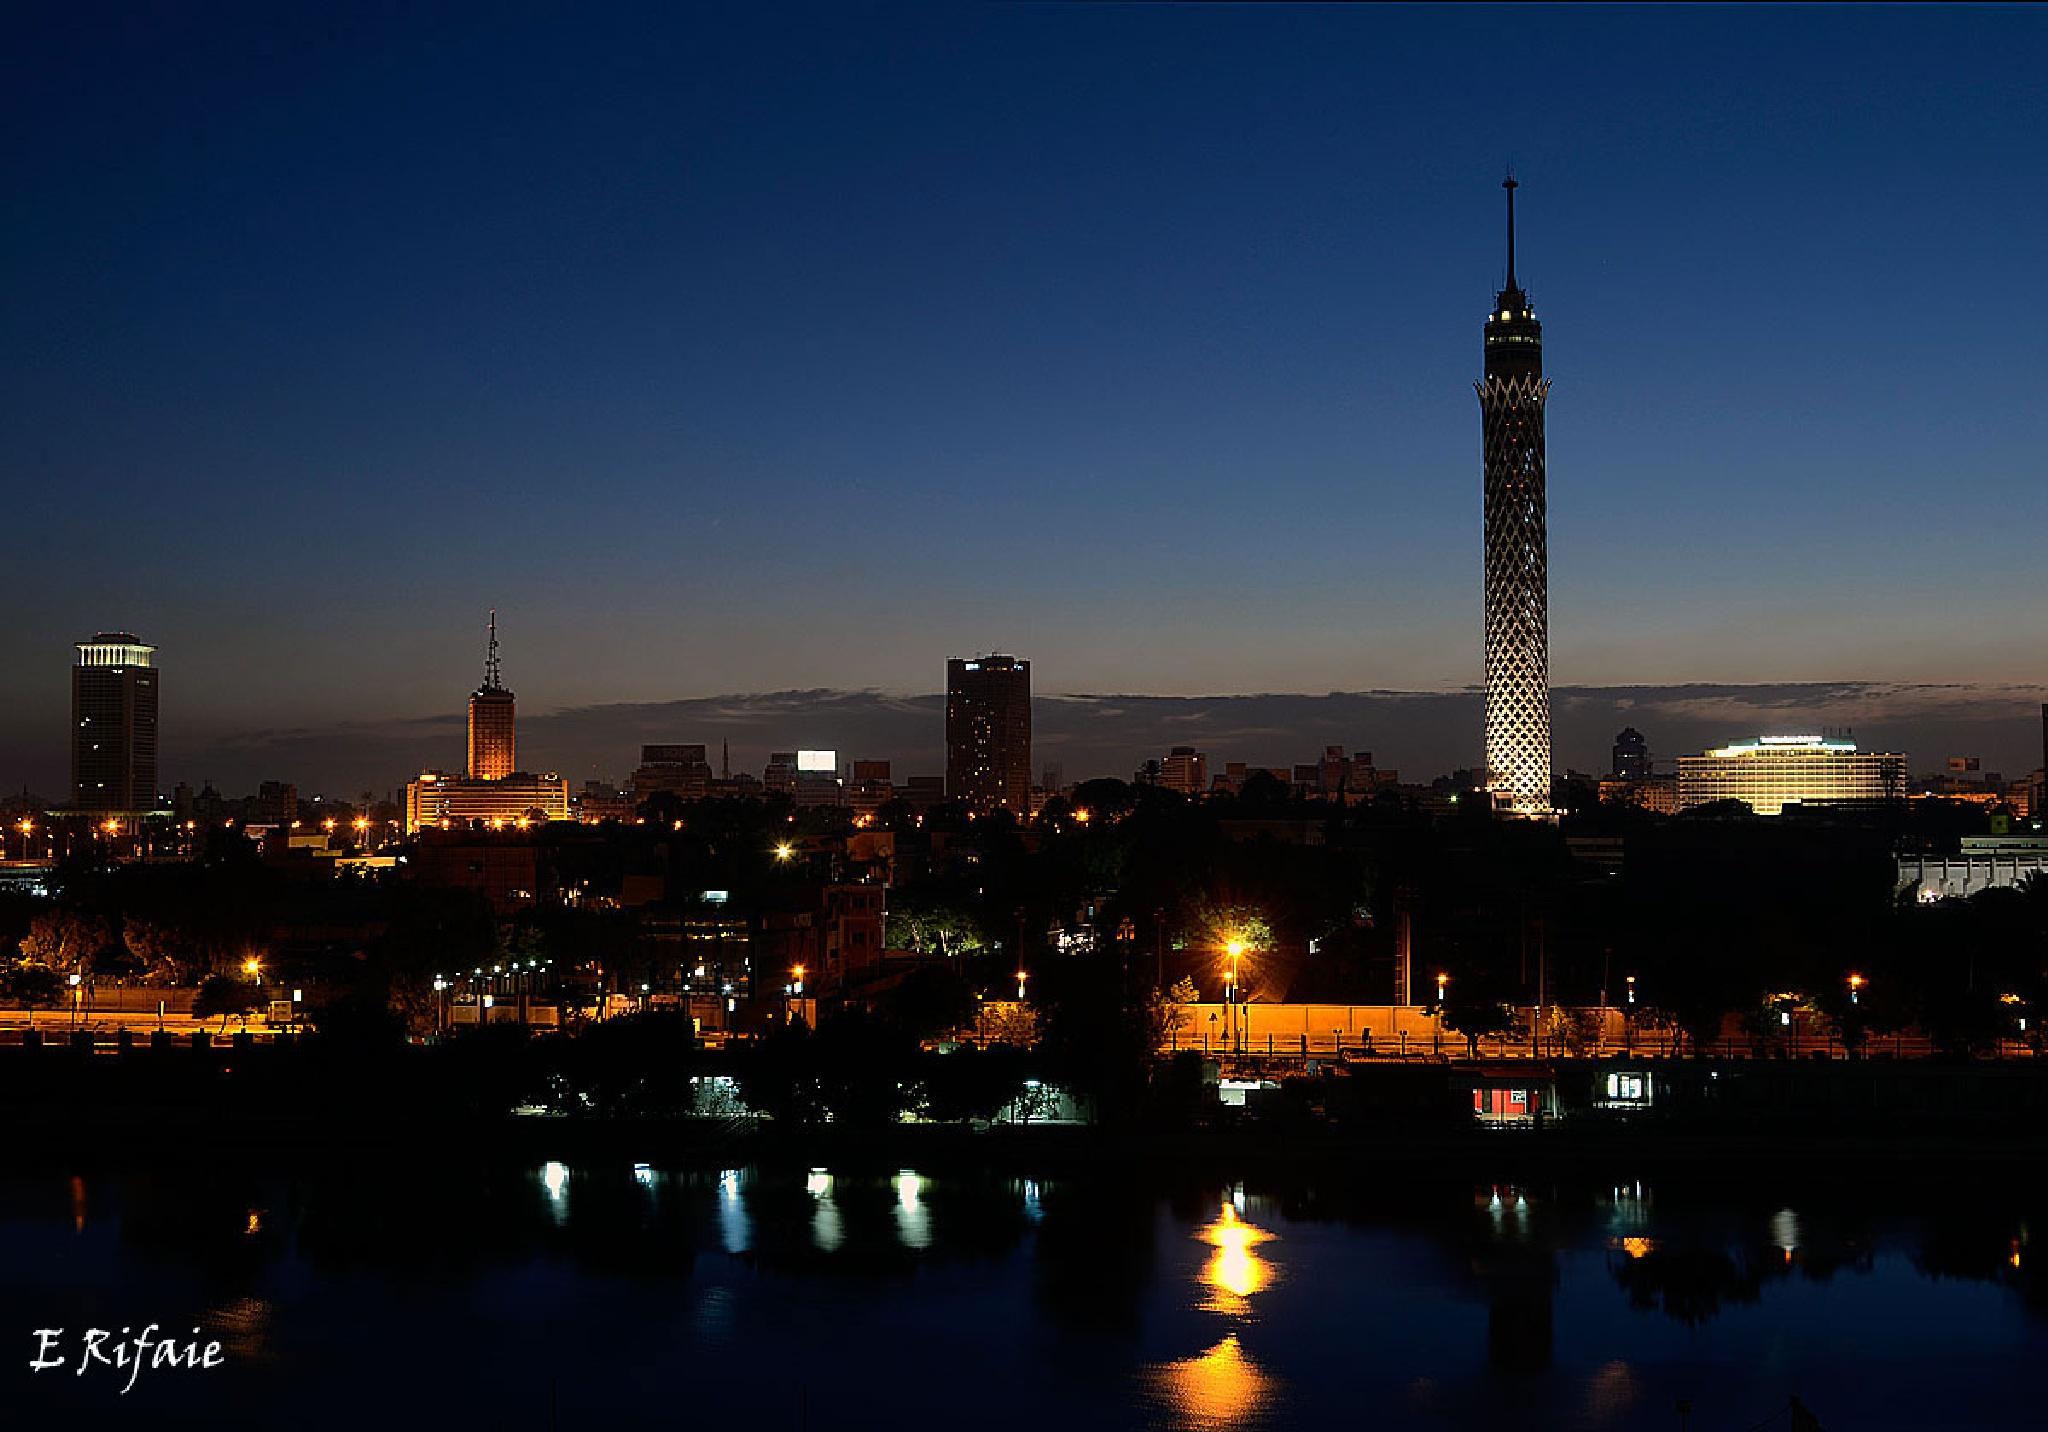 Cairo night by Emad Eldin Moustafa El Refaie